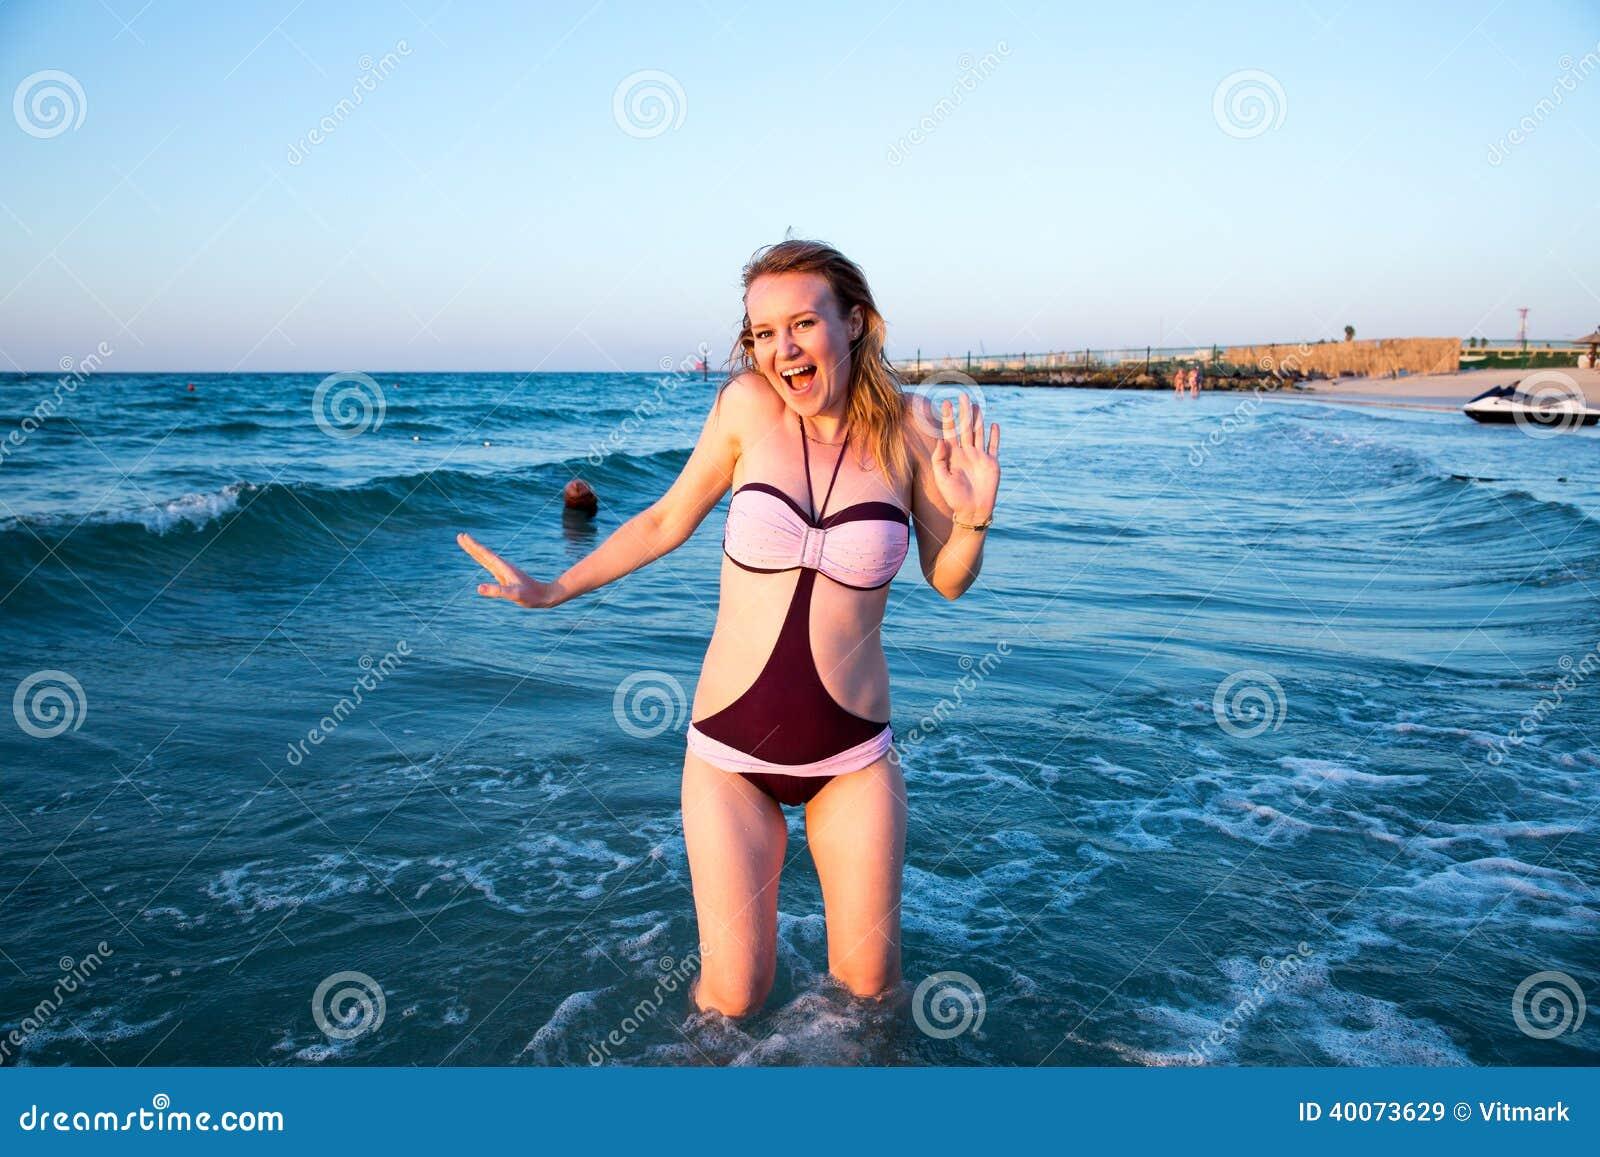 Topless tourist wife sexy eating ice cream in sunny beach bulgaria - 1 3